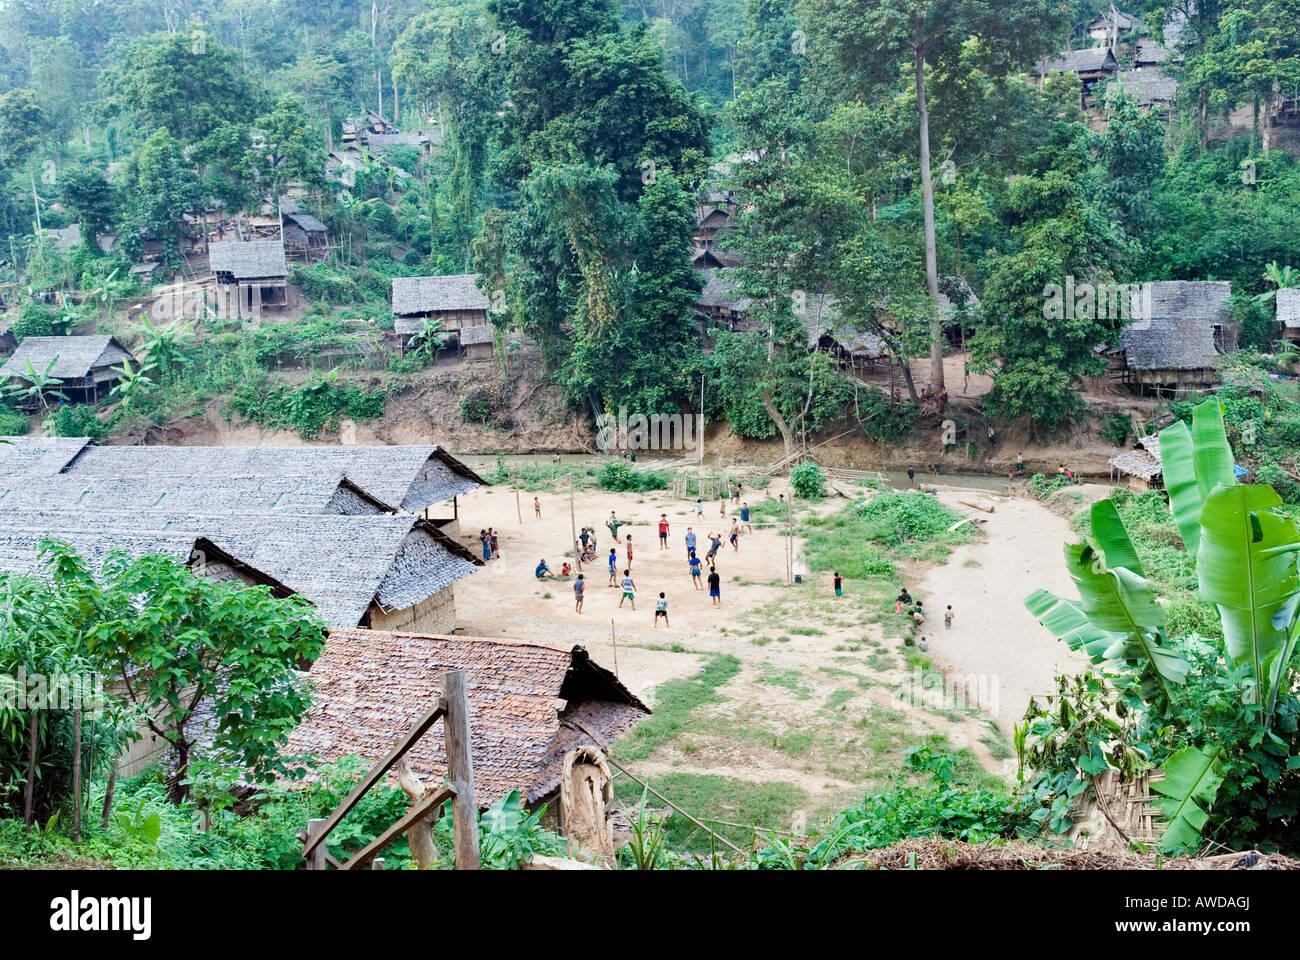 Refugee camp Ei Tu Hta, IDP-Area bordering Thailand near Mae Sariang, Birma Stock Photo